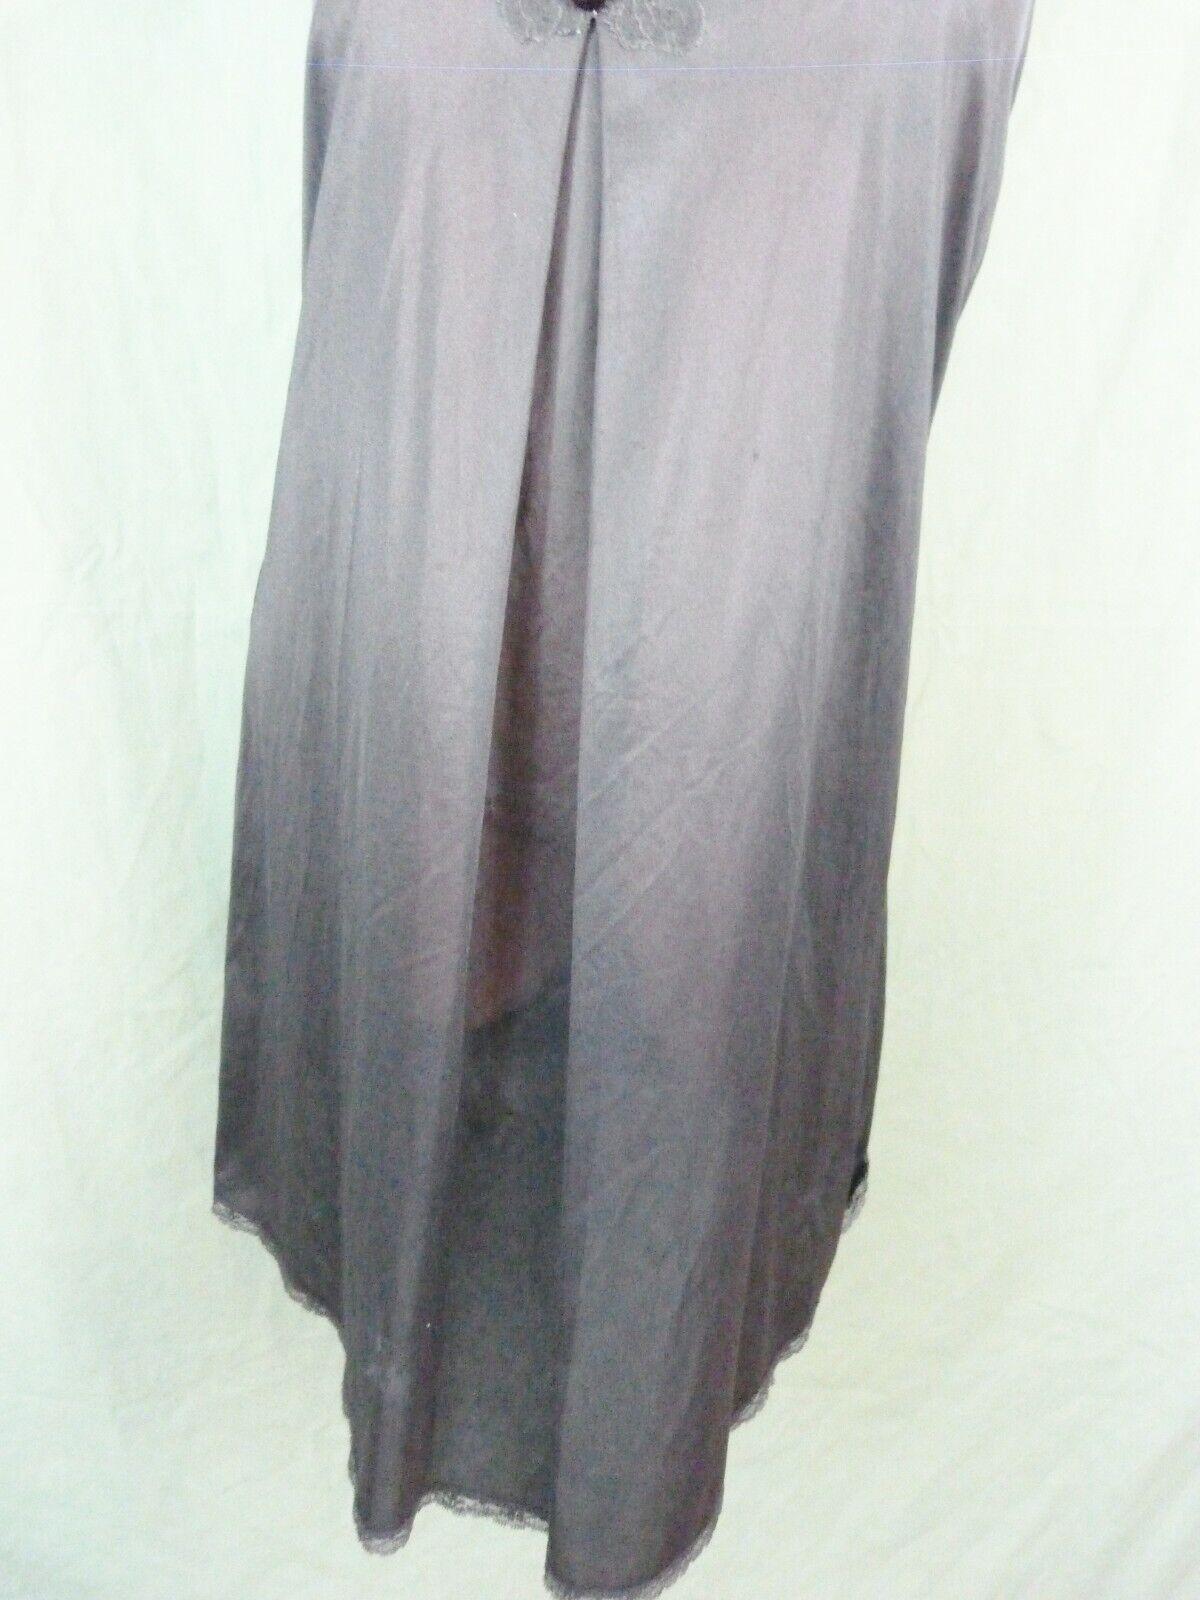 Texsheen Size Medium Full Slip Nightgown - image 5